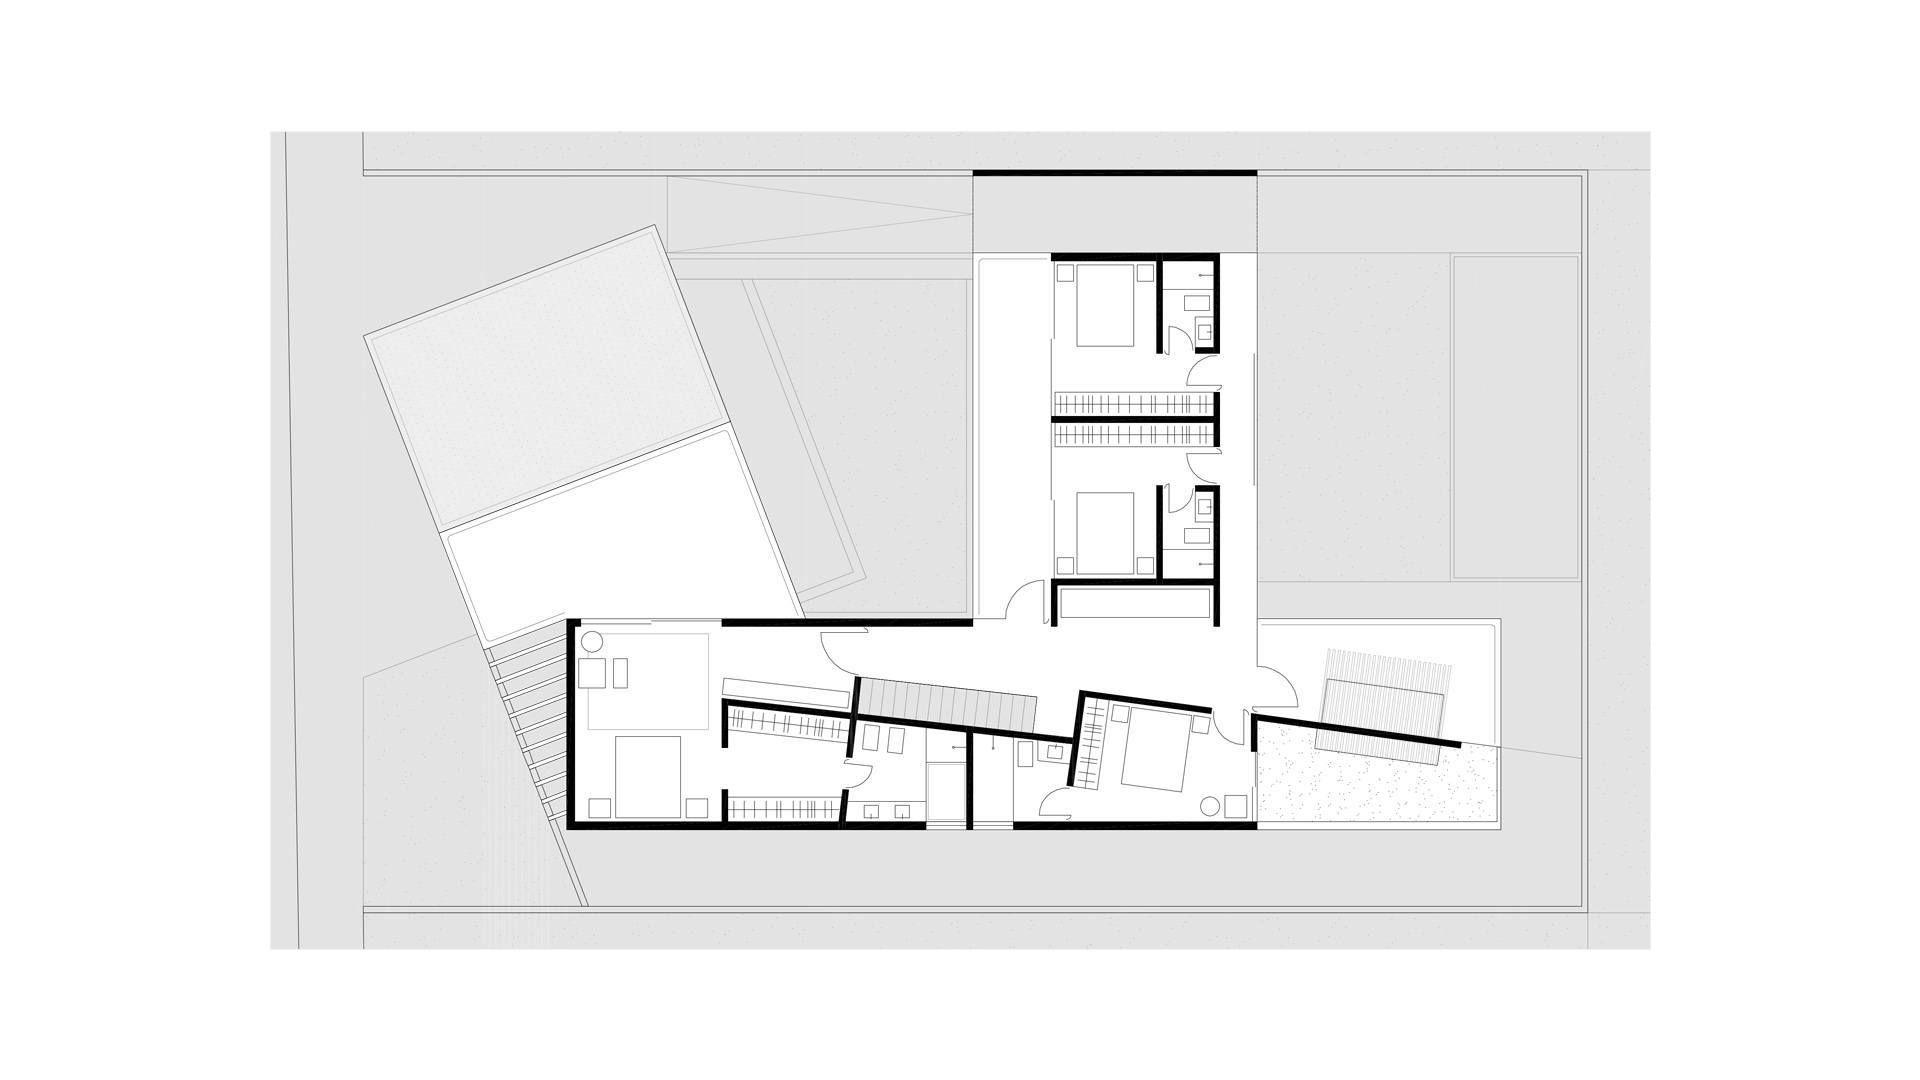 residencia-aldeia-da-serra-planta-1-pav